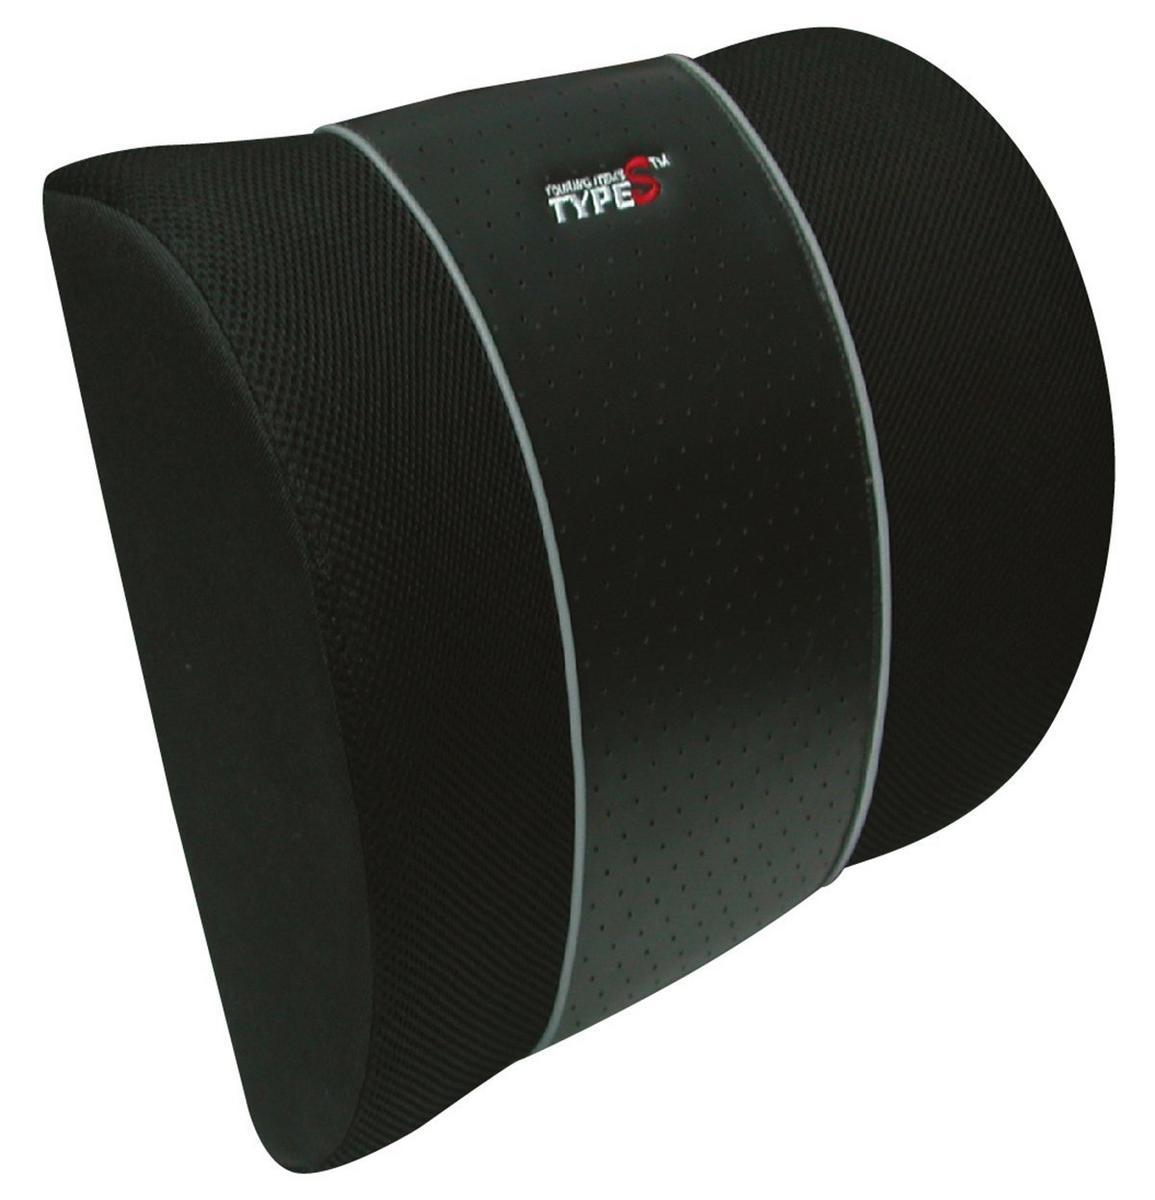 Type S CU11822 Black Classic Lumbar Support Cushion Single